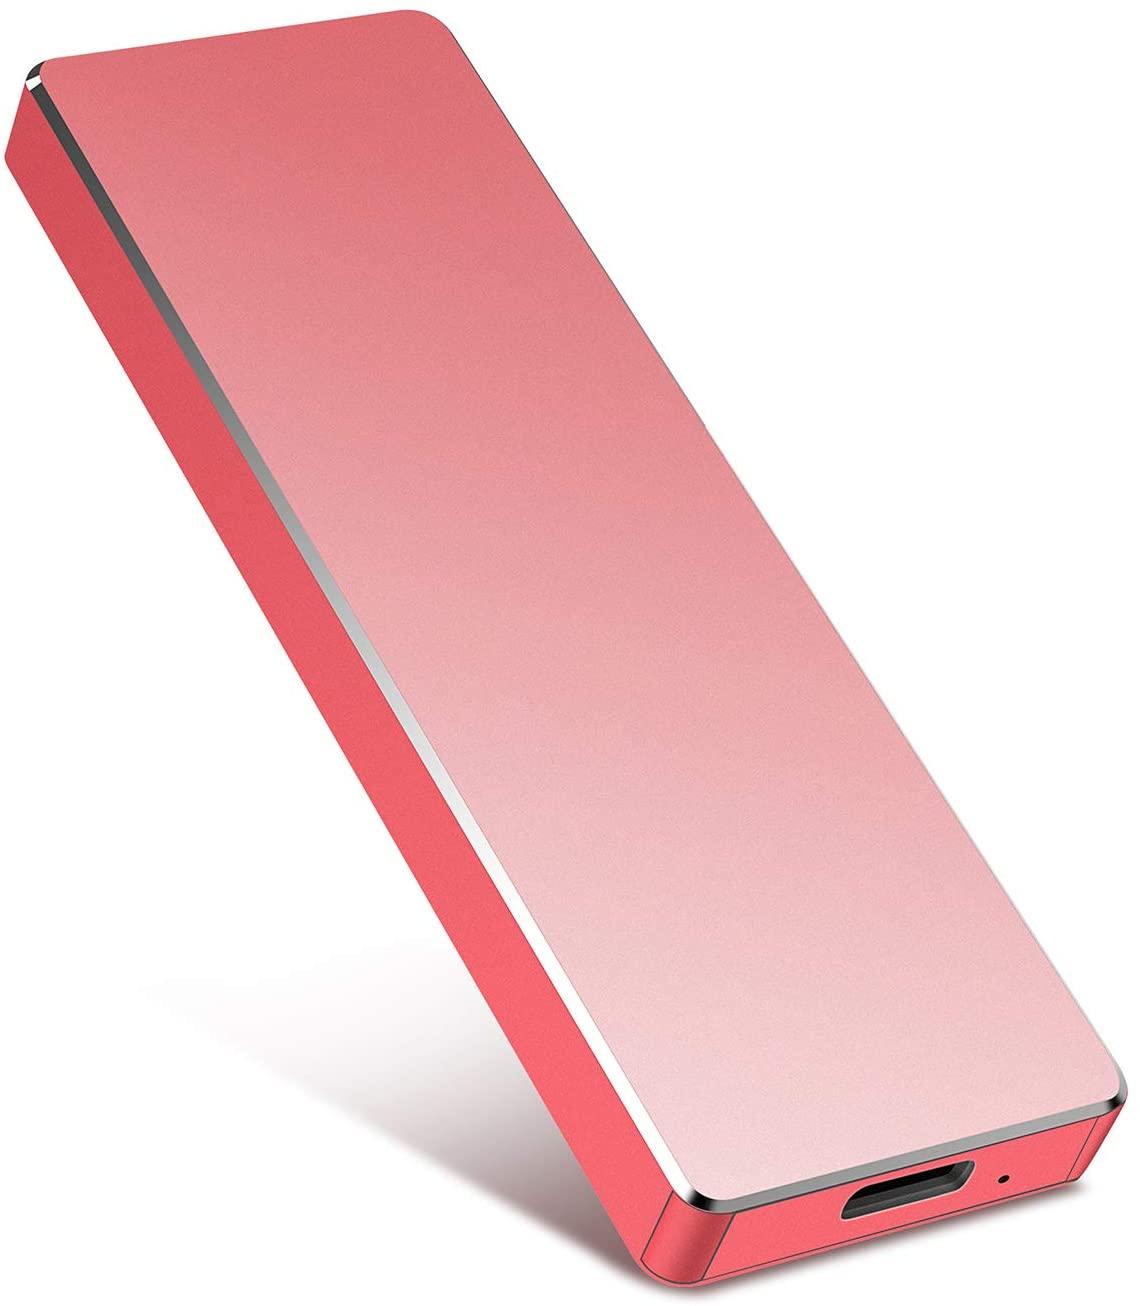 Portable External Hard Drive 1TB 2TB Portable Hard Drive External Type C USB3.1 HDD Storage Compatible for Mac, PC, Desktop, Laptop, Xbox One (Red,1TB)